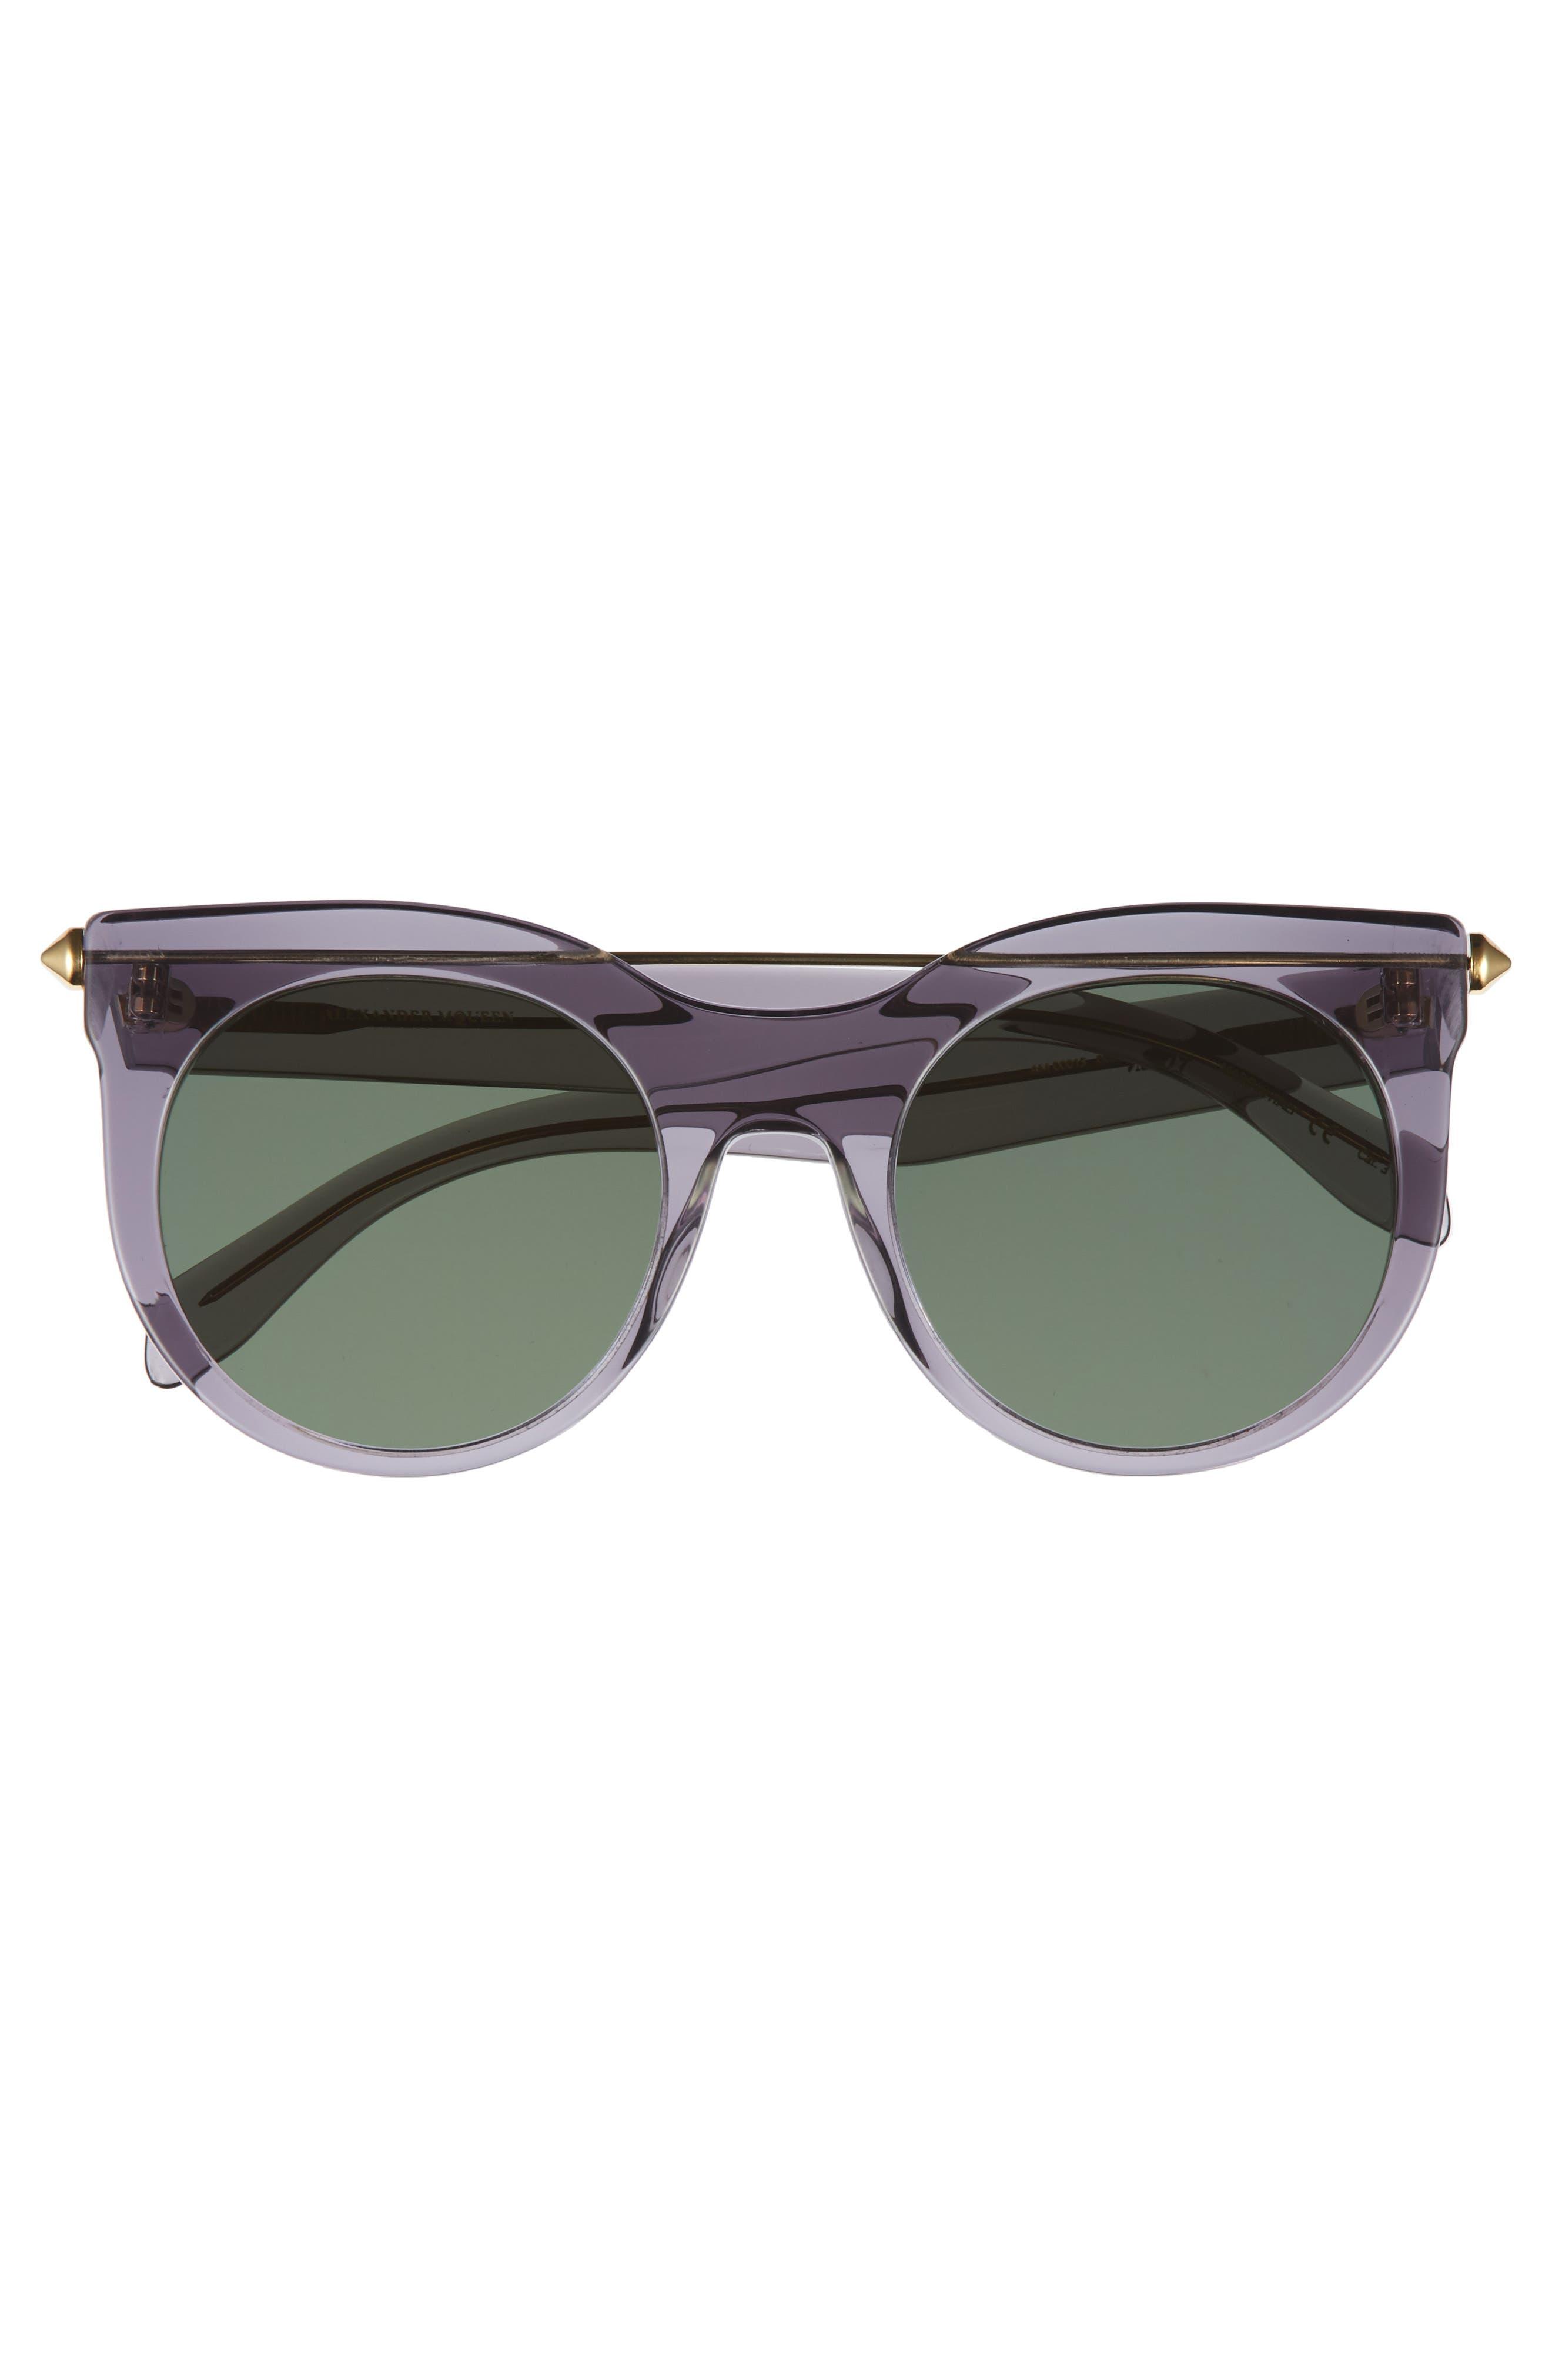 52mm Cat Eye Sunglasses,                             Alternate thumbnail 3, color,                             Grey